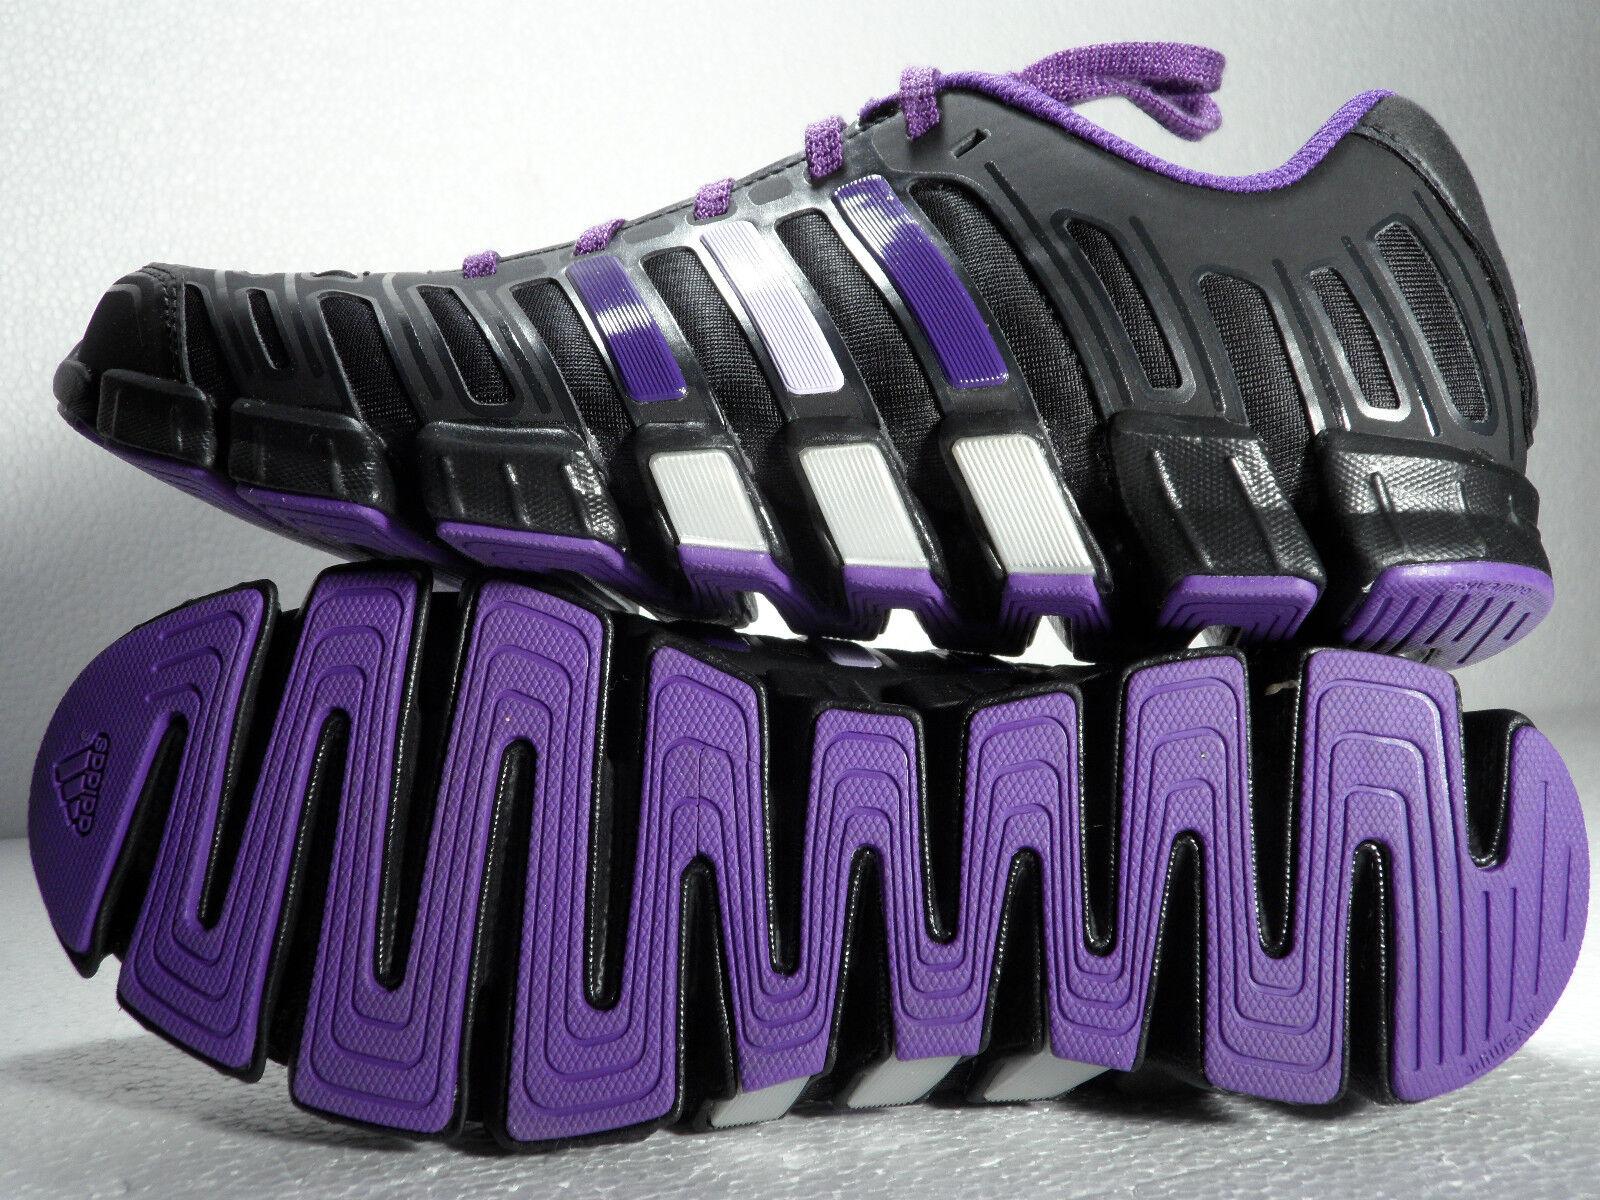 ADIDAS CC ULTRA X WOMAN SZ  6.5 - 10.0 noir violet COMFORT FASHION RUNNING NIB